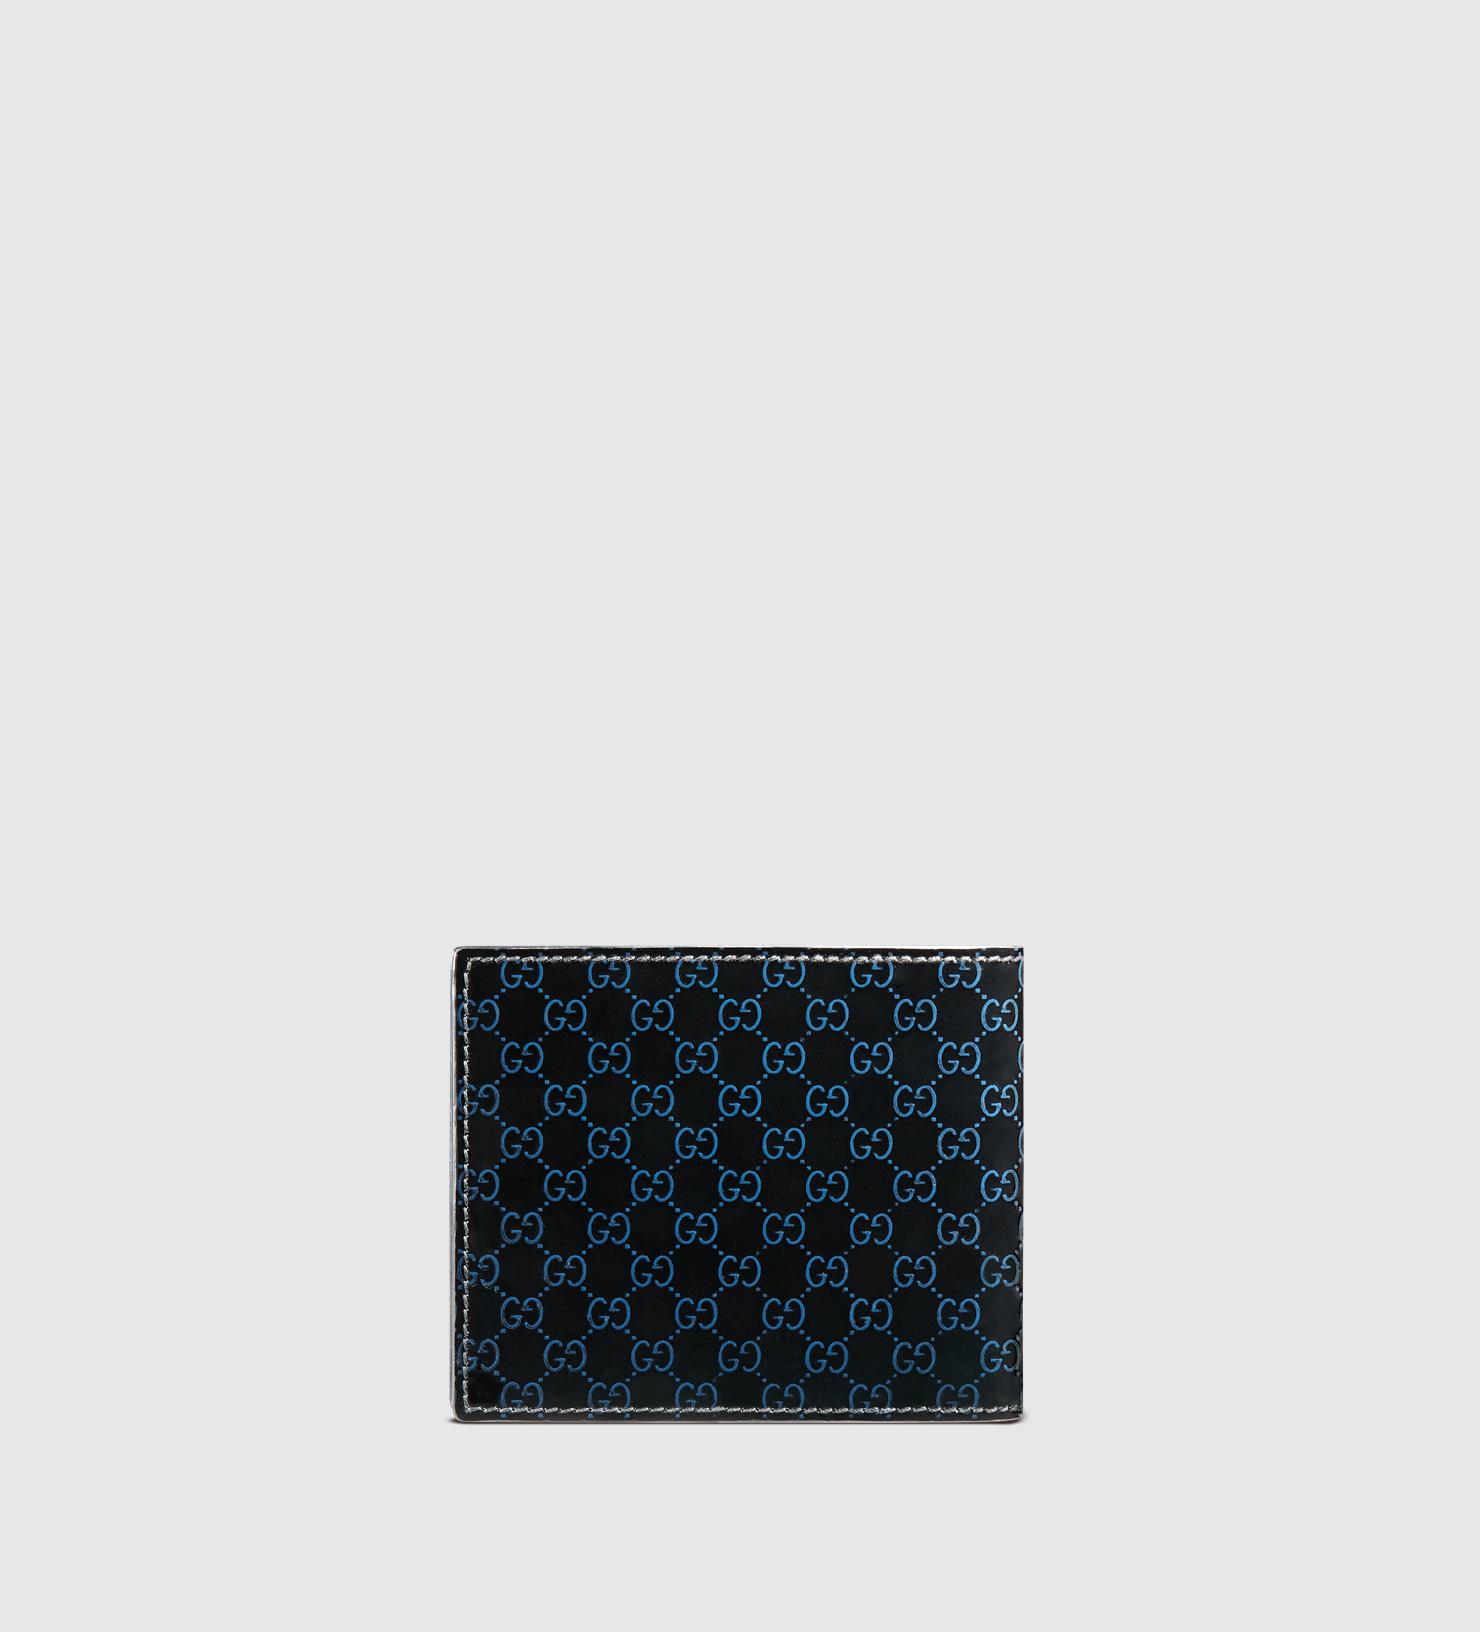 61f4de27c1a Gucci Microssima Patent Leather Bi-fold Wallet in Black - Lyst